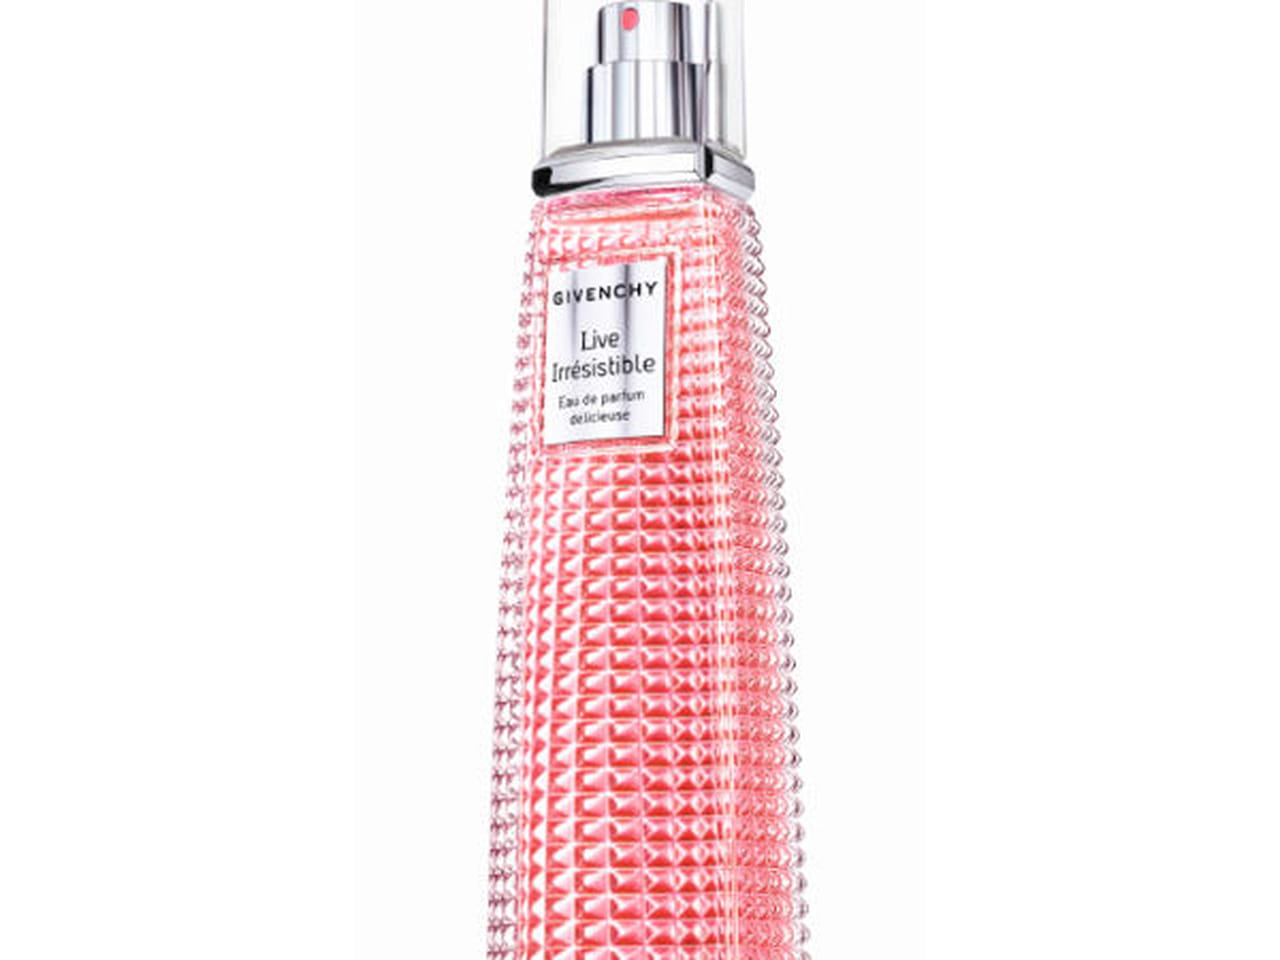 De Live Délicieuse Givenchy IrrésistibleEau Parfum Yybf76g